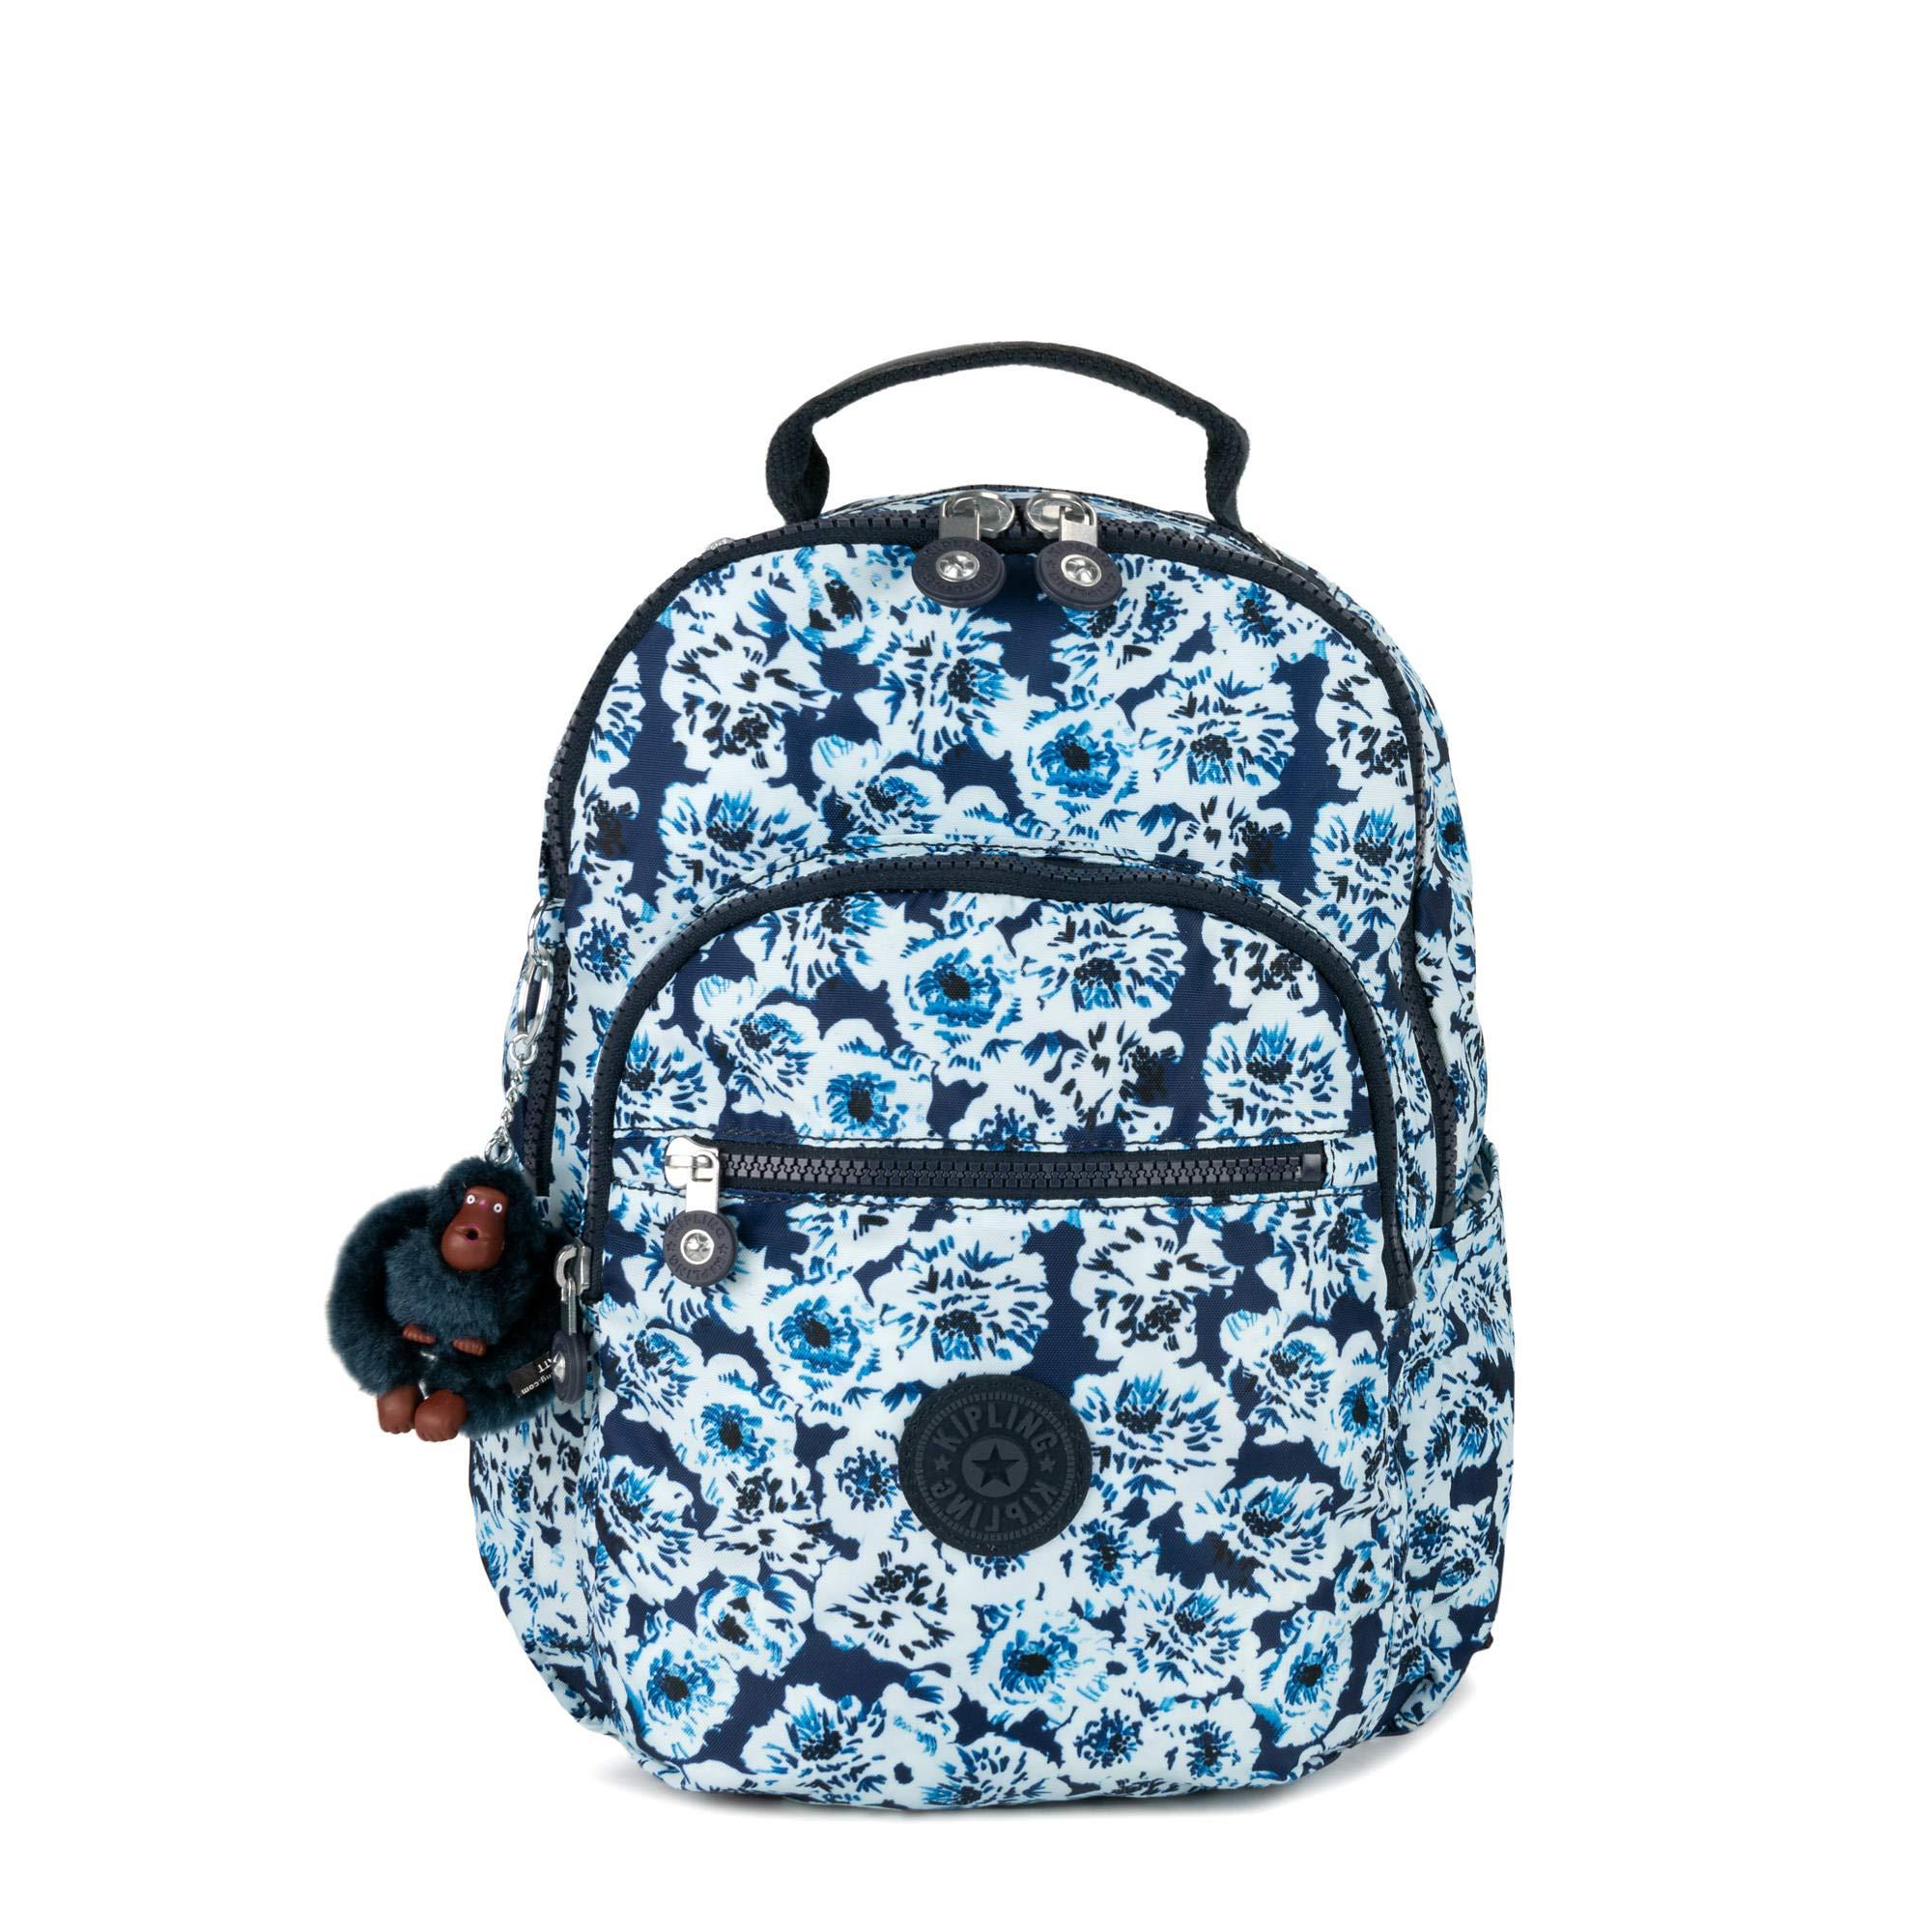 Kipling Seoul Go Small Printed Backpack One Size Roaming Roses